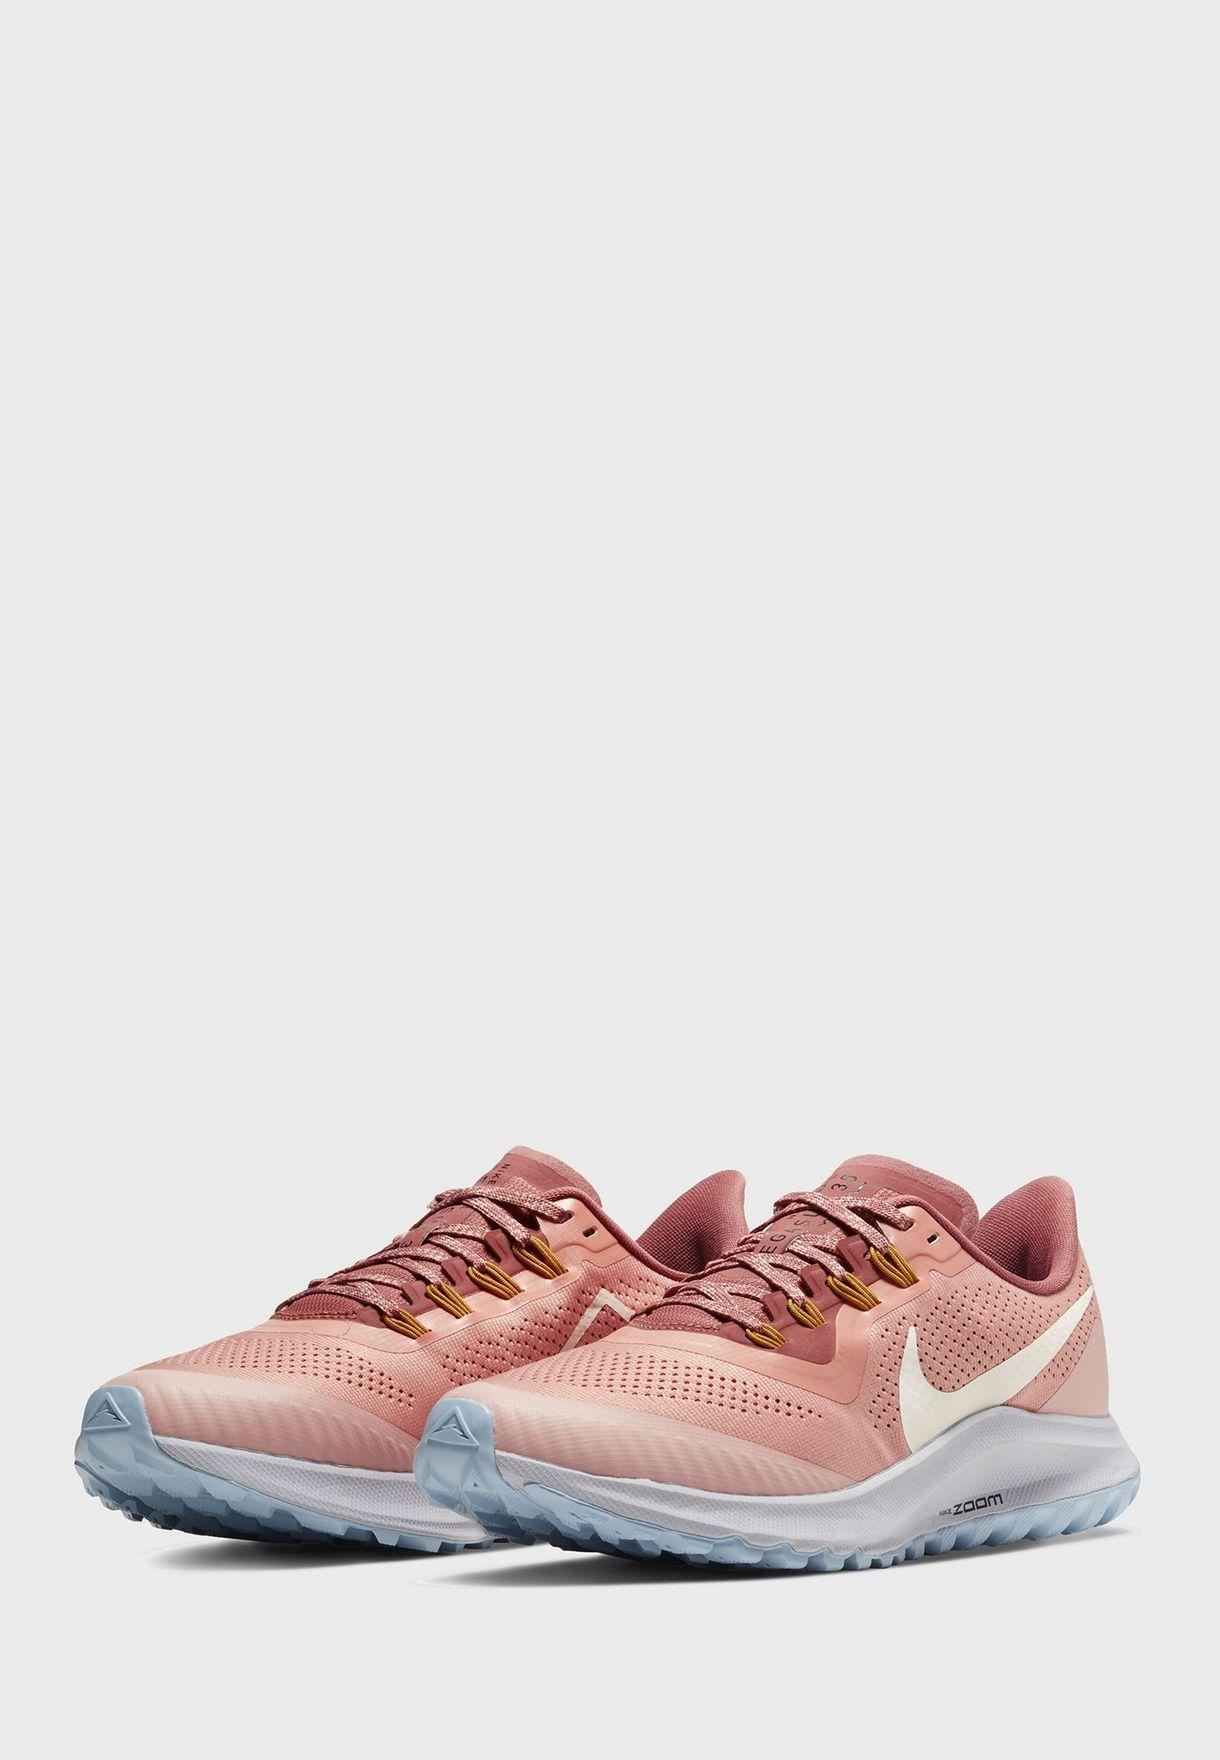 حذاء اير زوم بيجاسوس 36 تريل